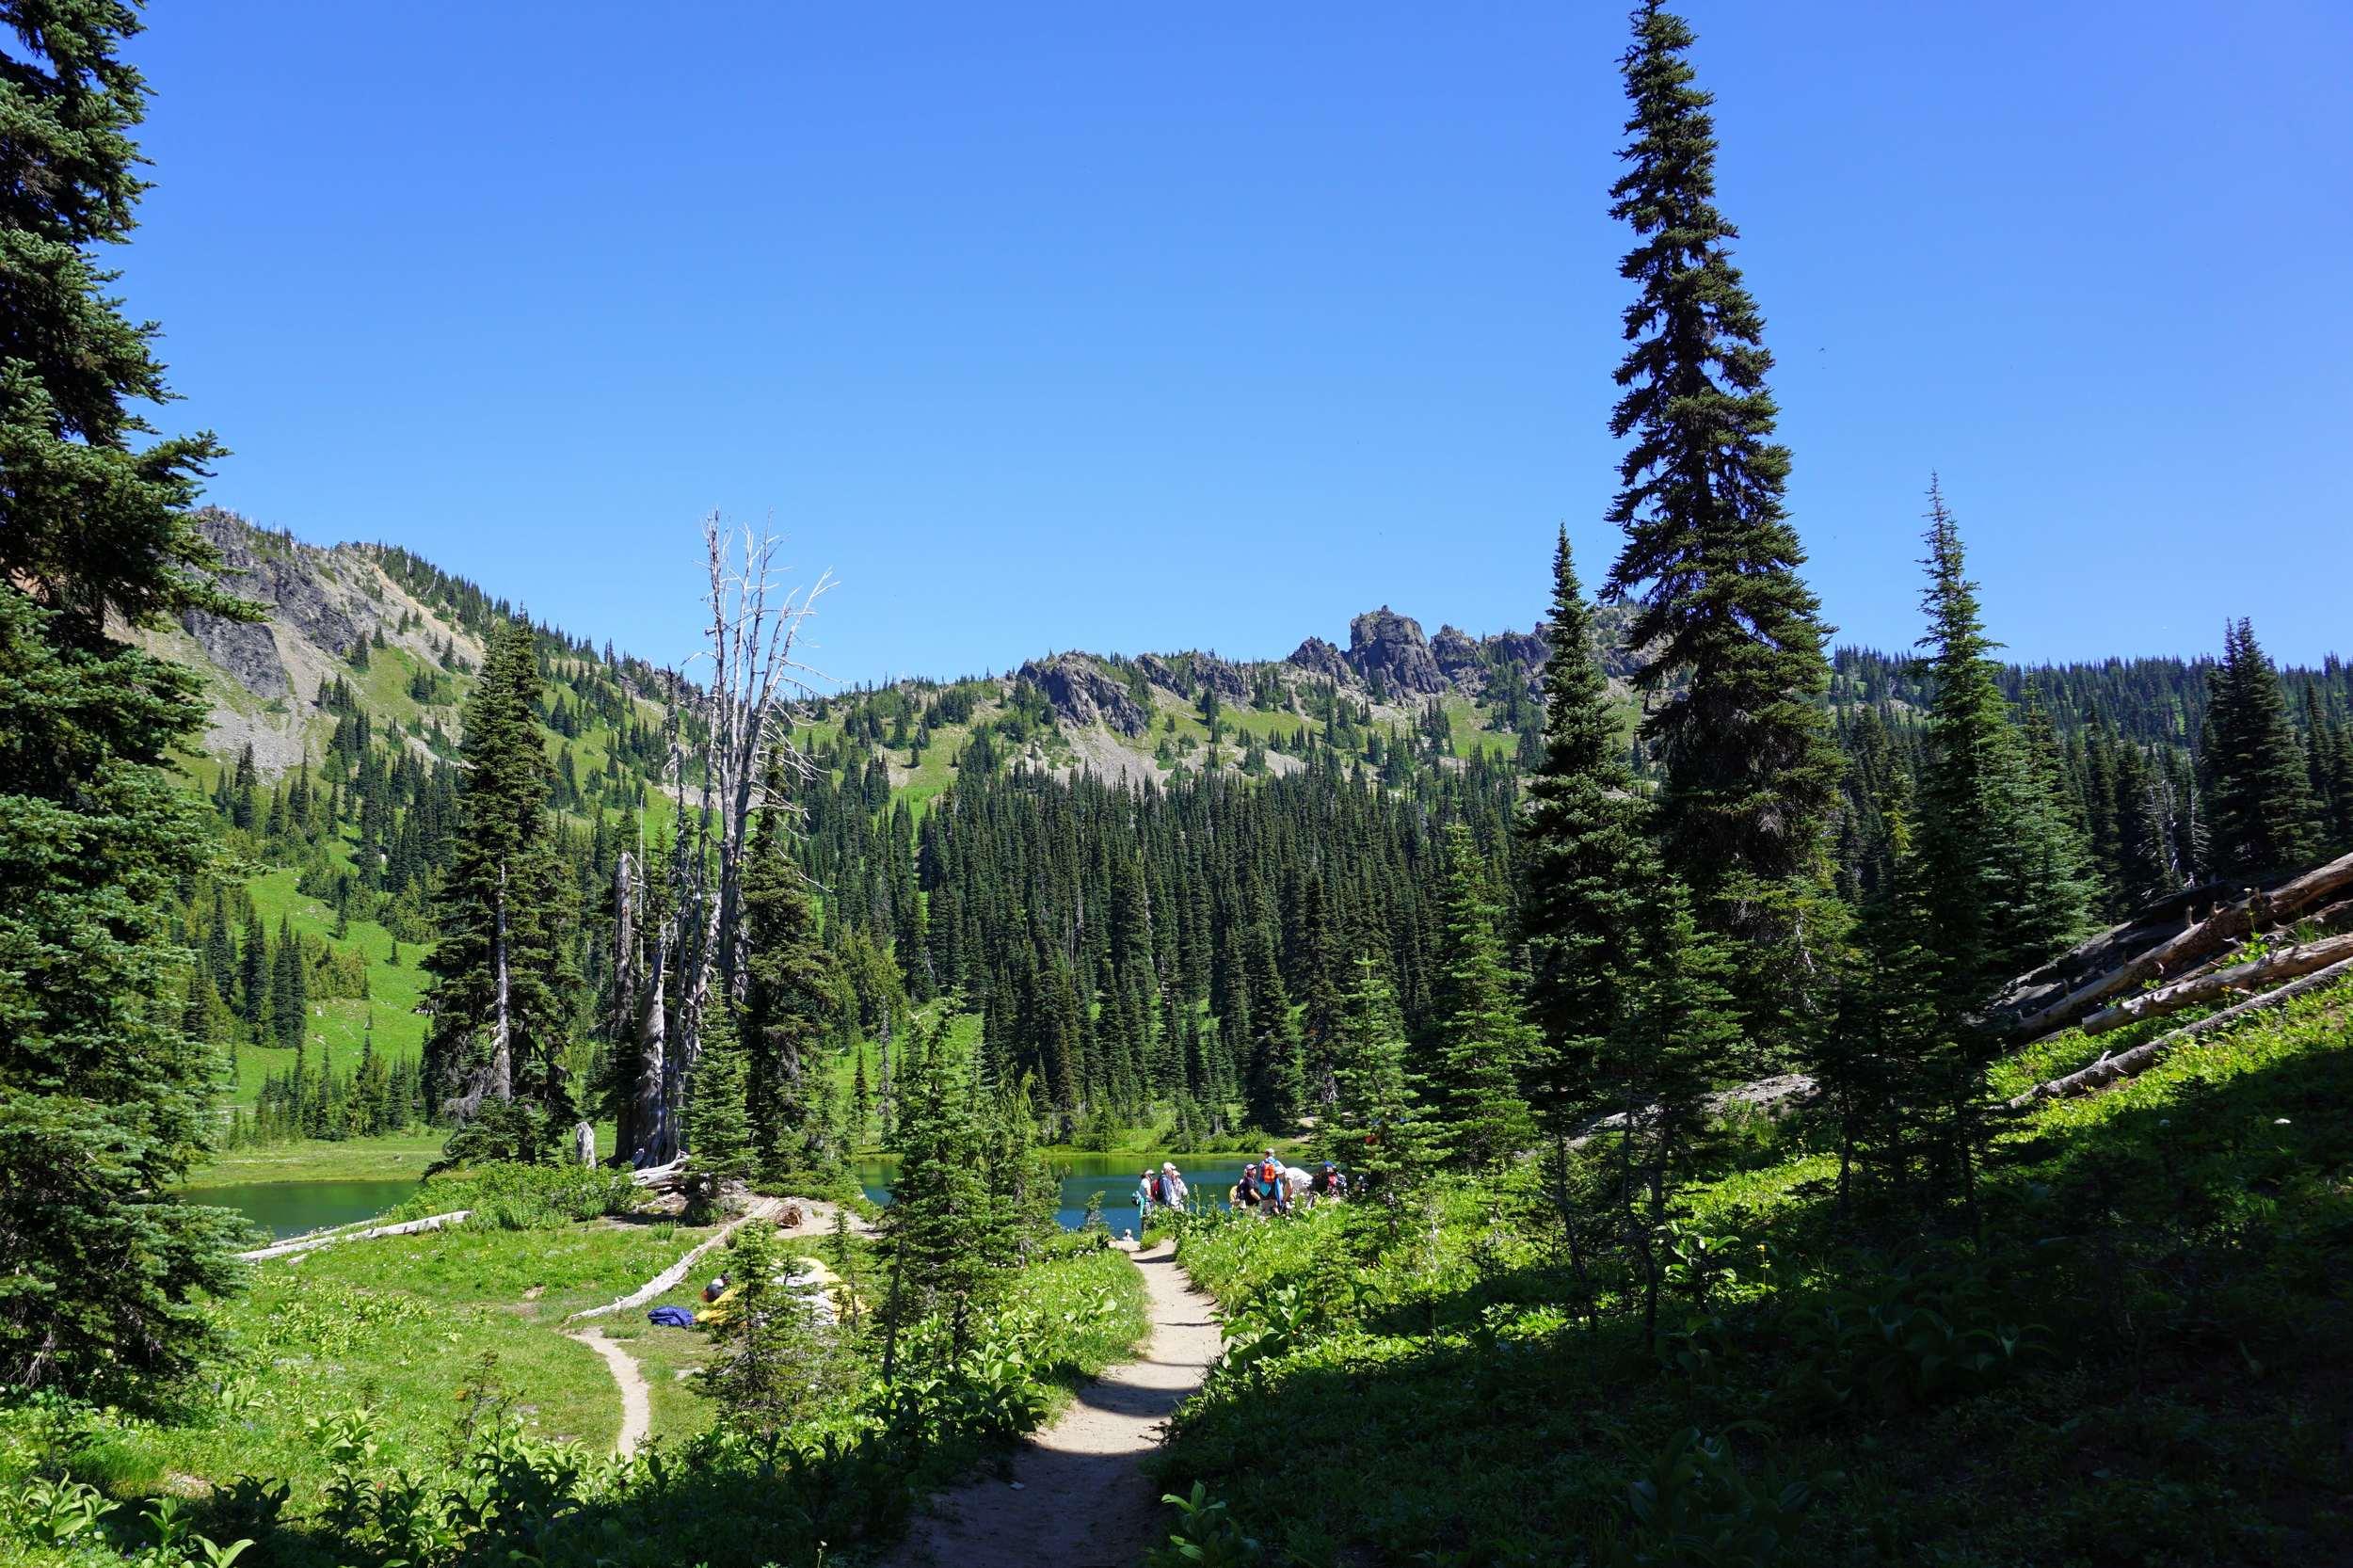 Hiking to Sheep Lake